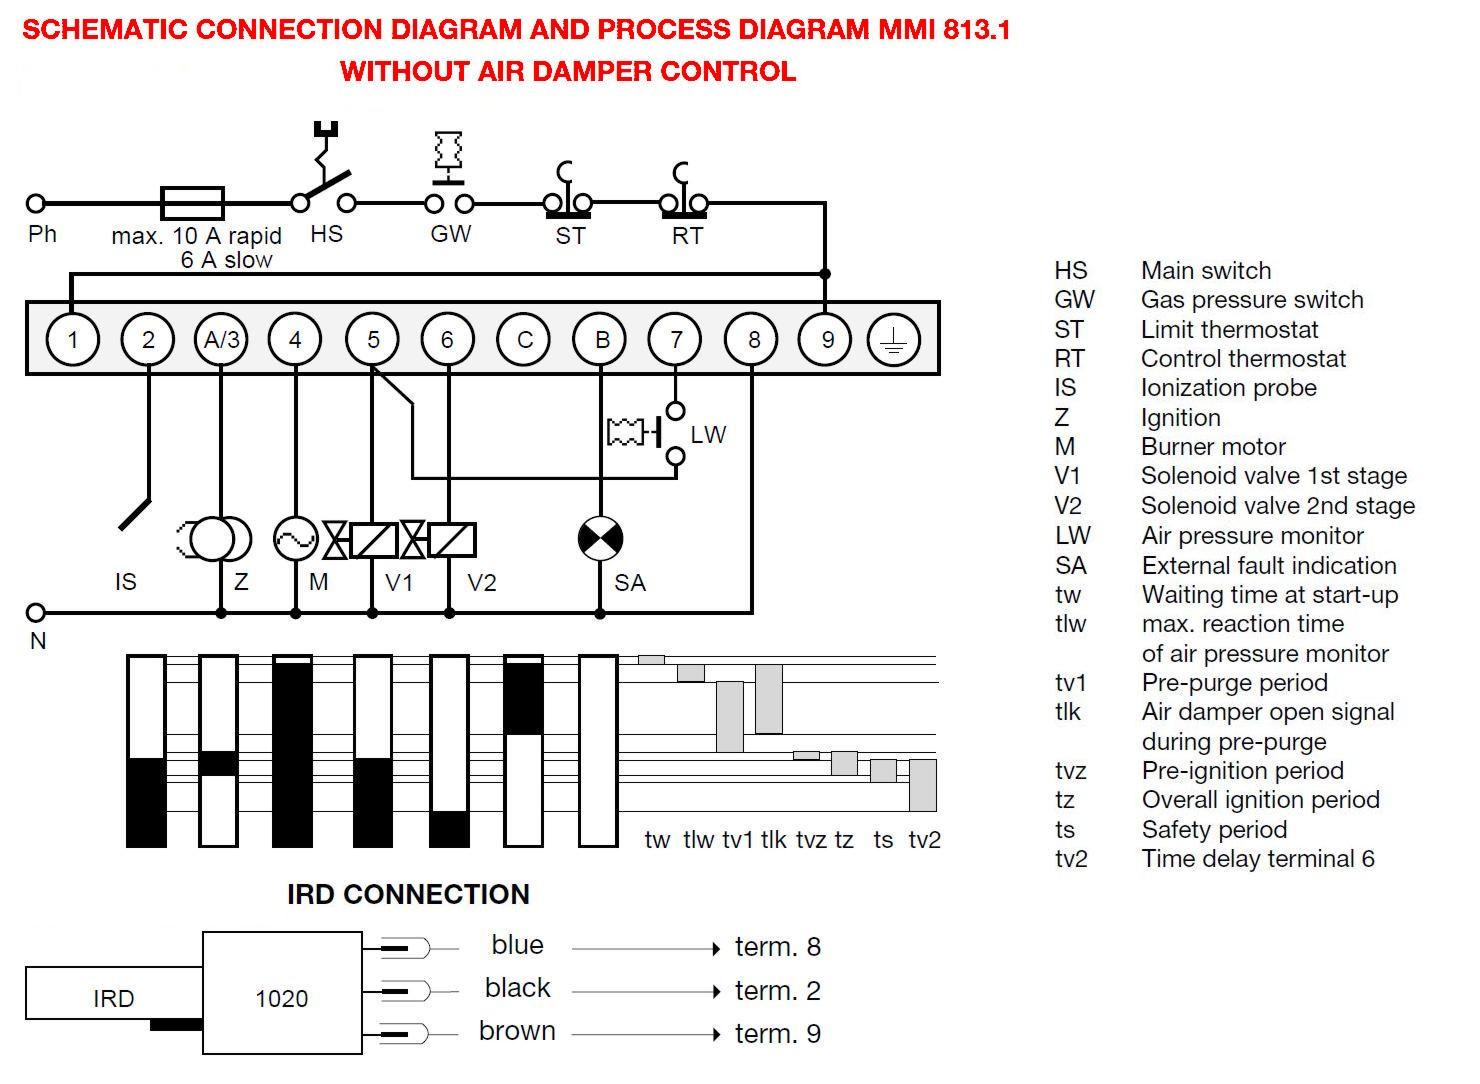 SATRONIC_MMI 813.1 mod 23_SCHEMA_ELECTRICA